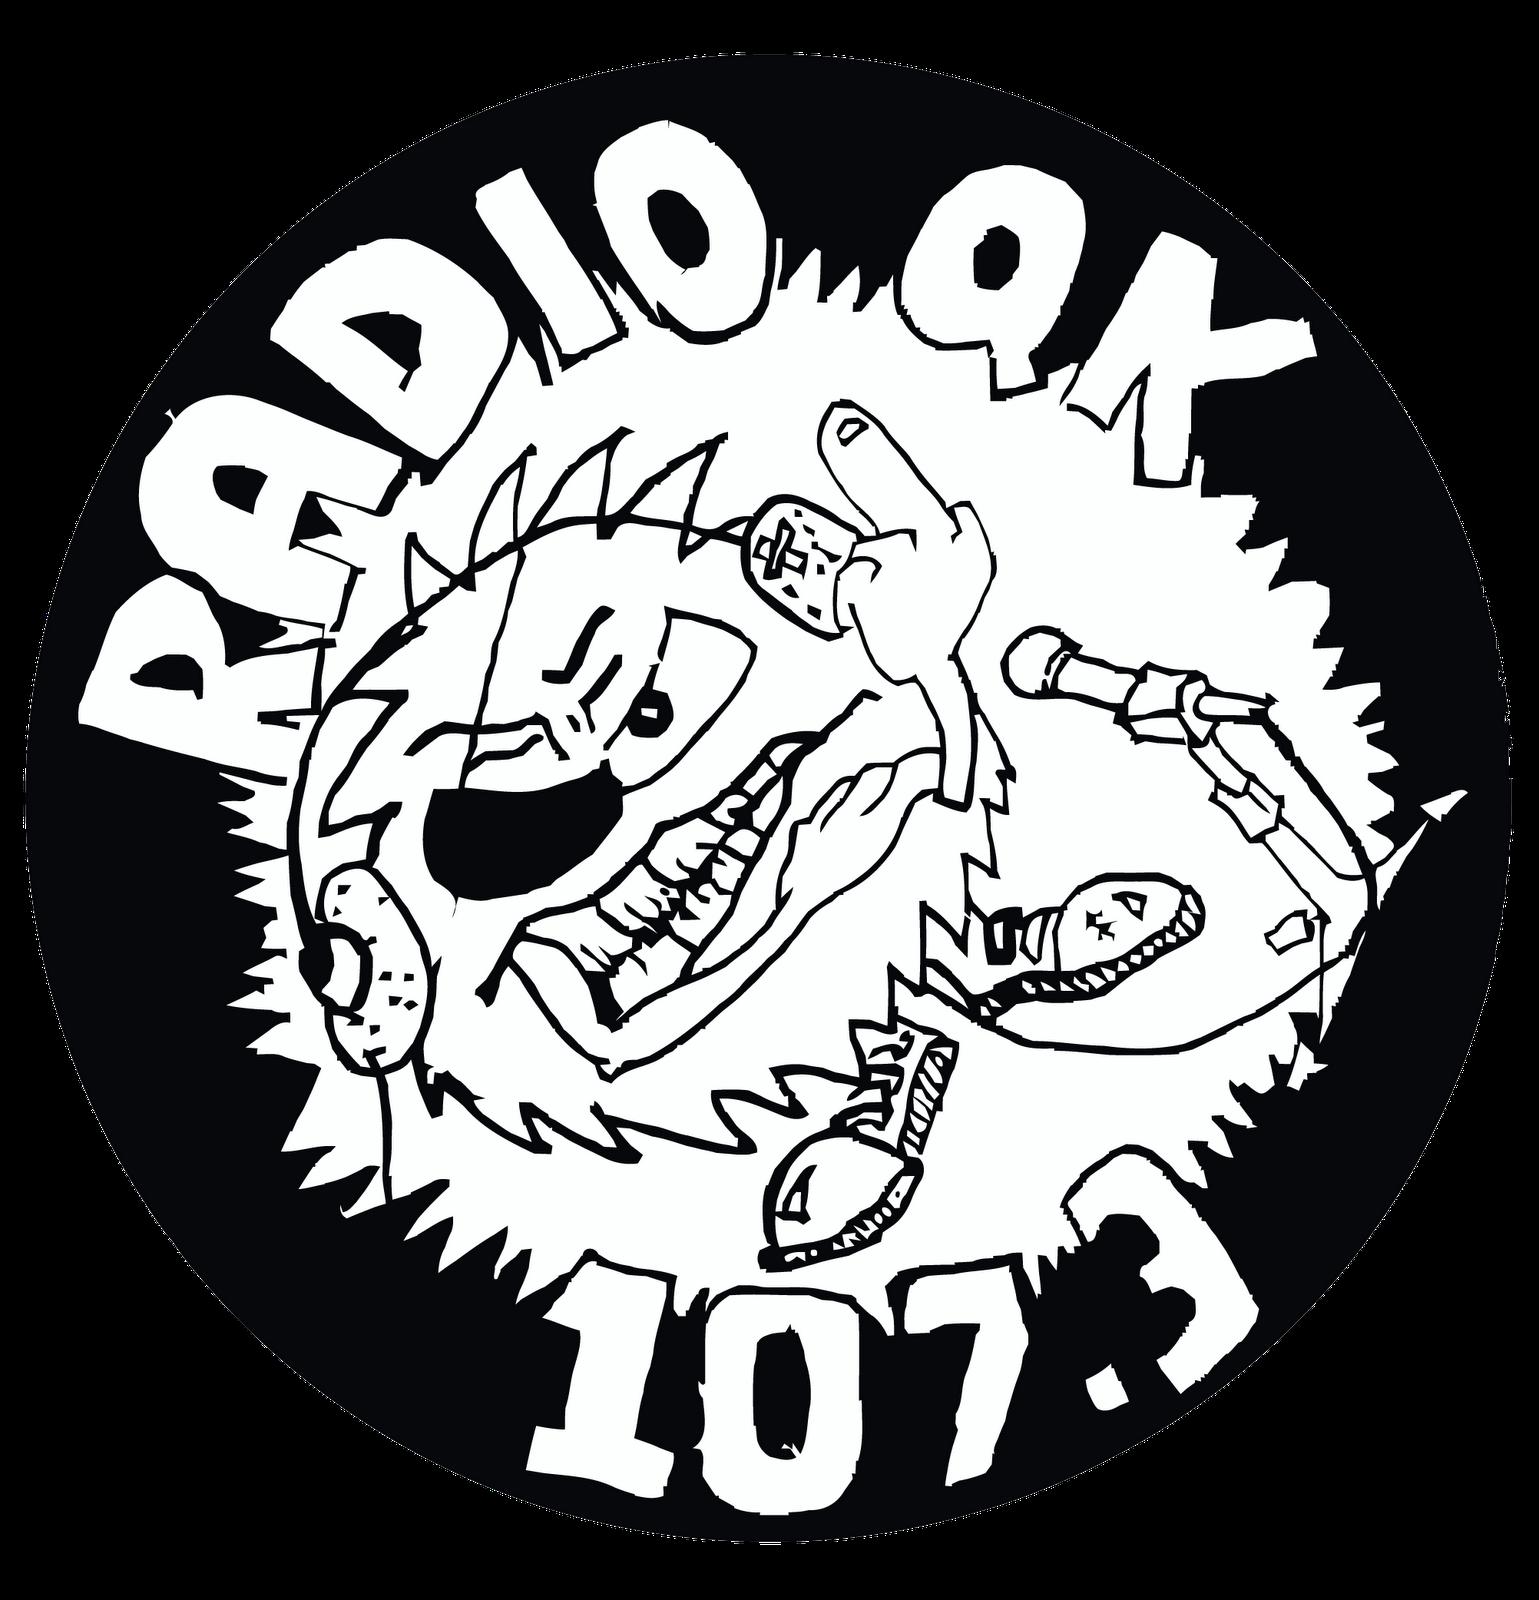 21 Radio QK